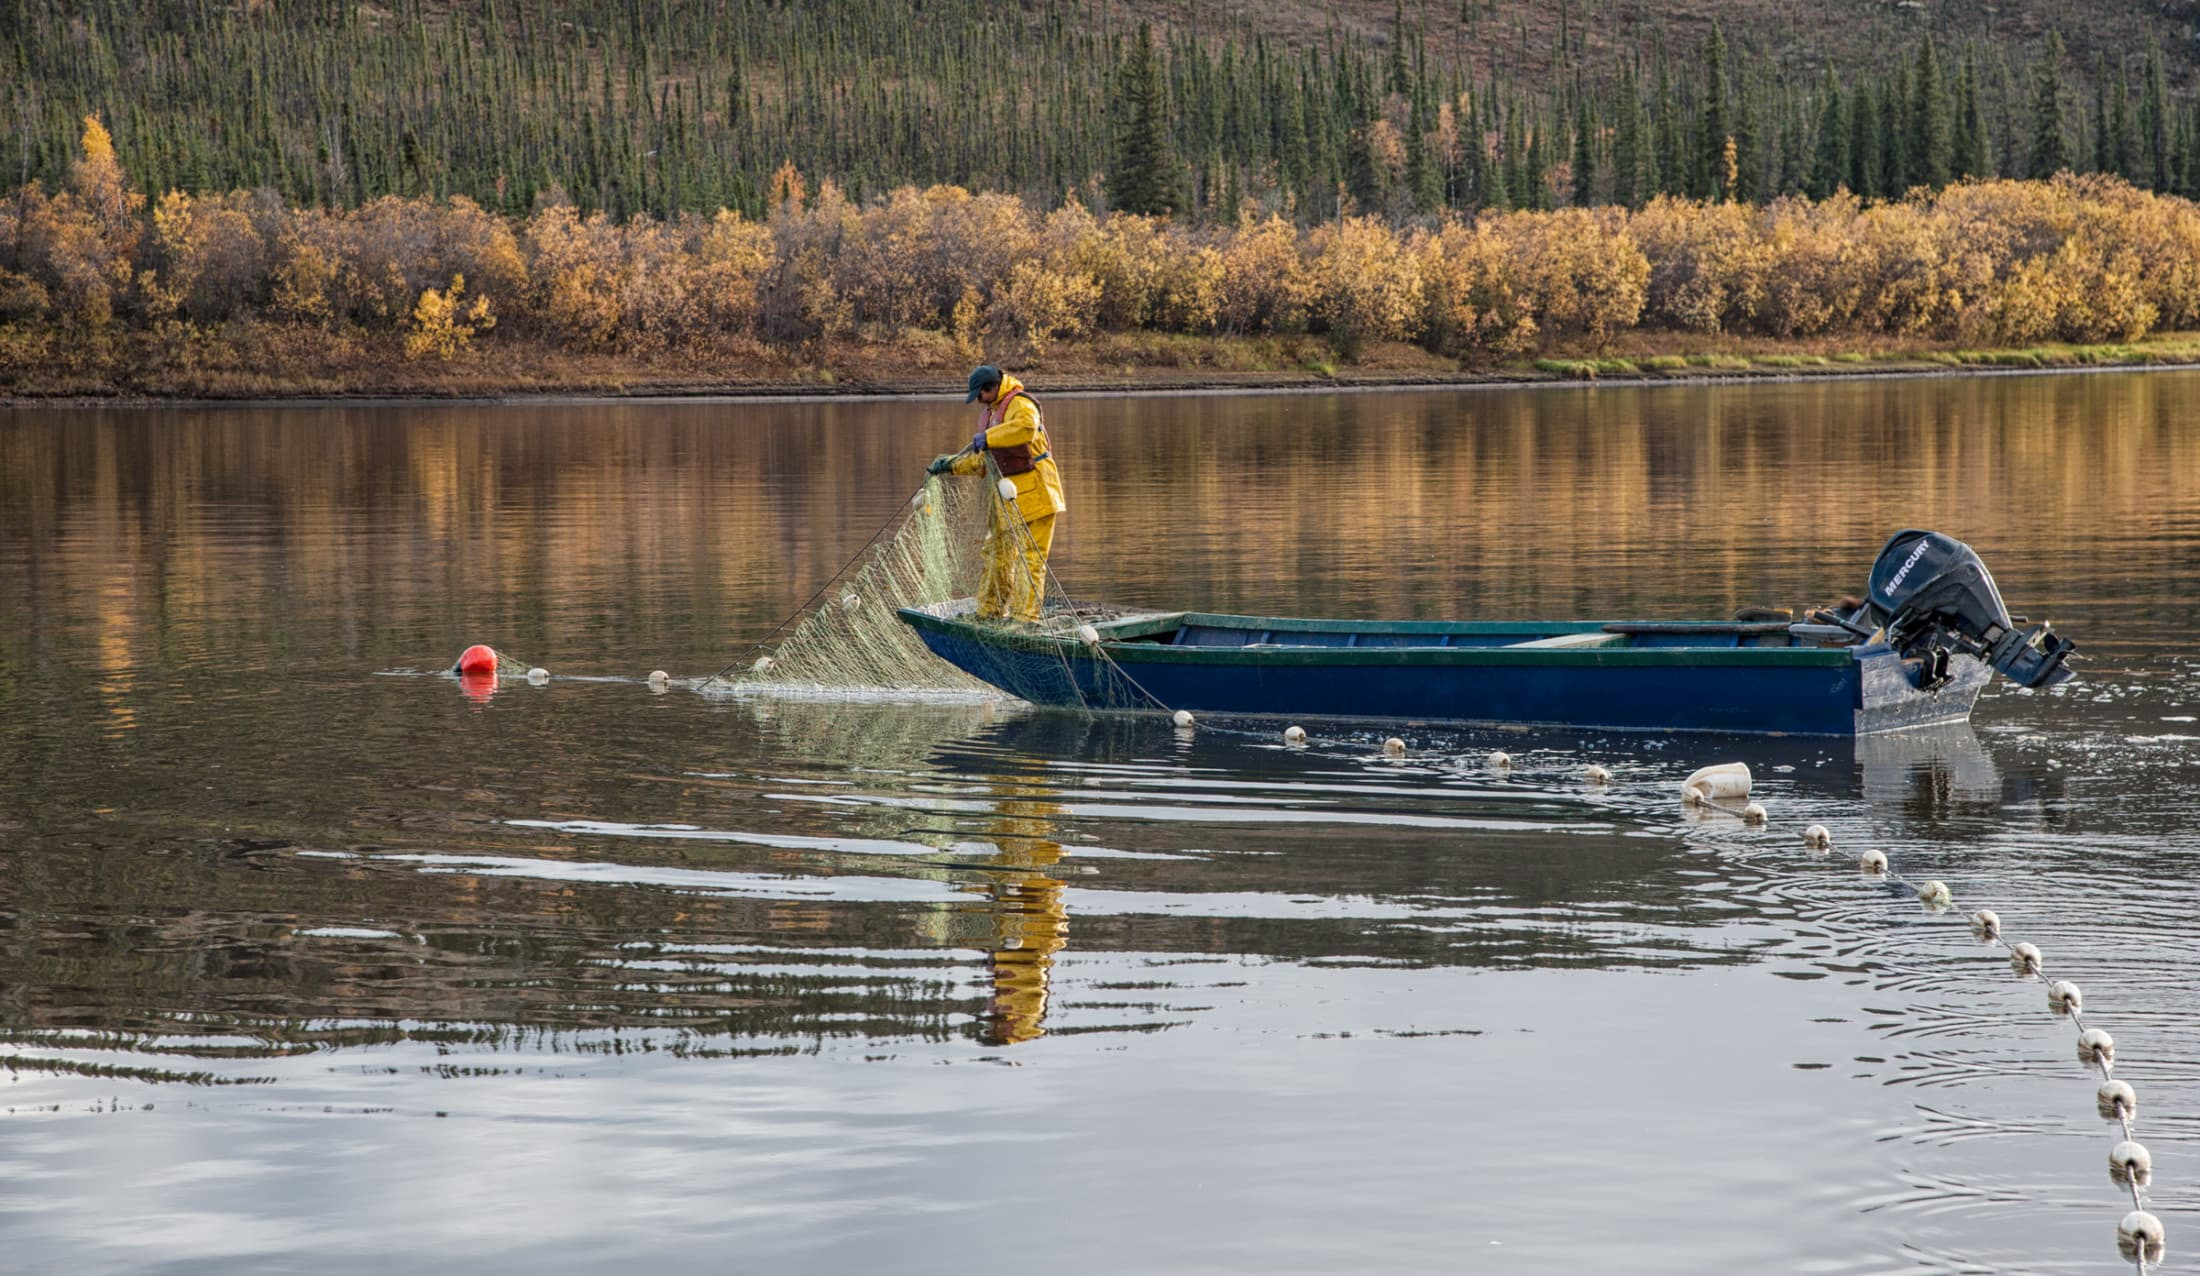 Vicky Josie salmon fishing Porcupine River, Yukon Territory, Canada.